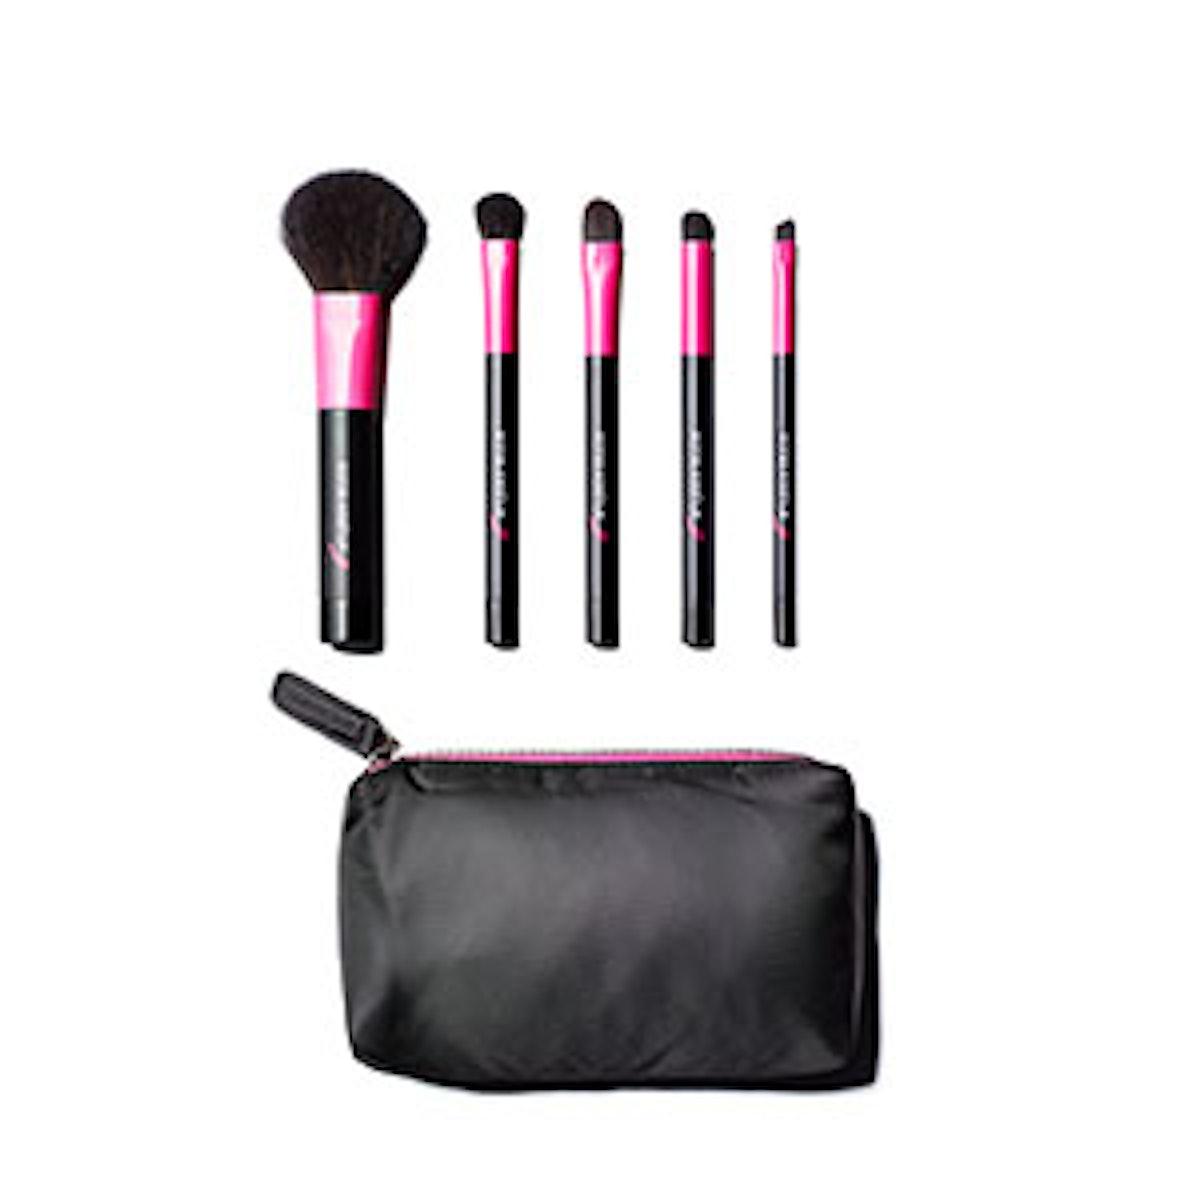 Proudly Pink Five-Piece Purse Brush Set